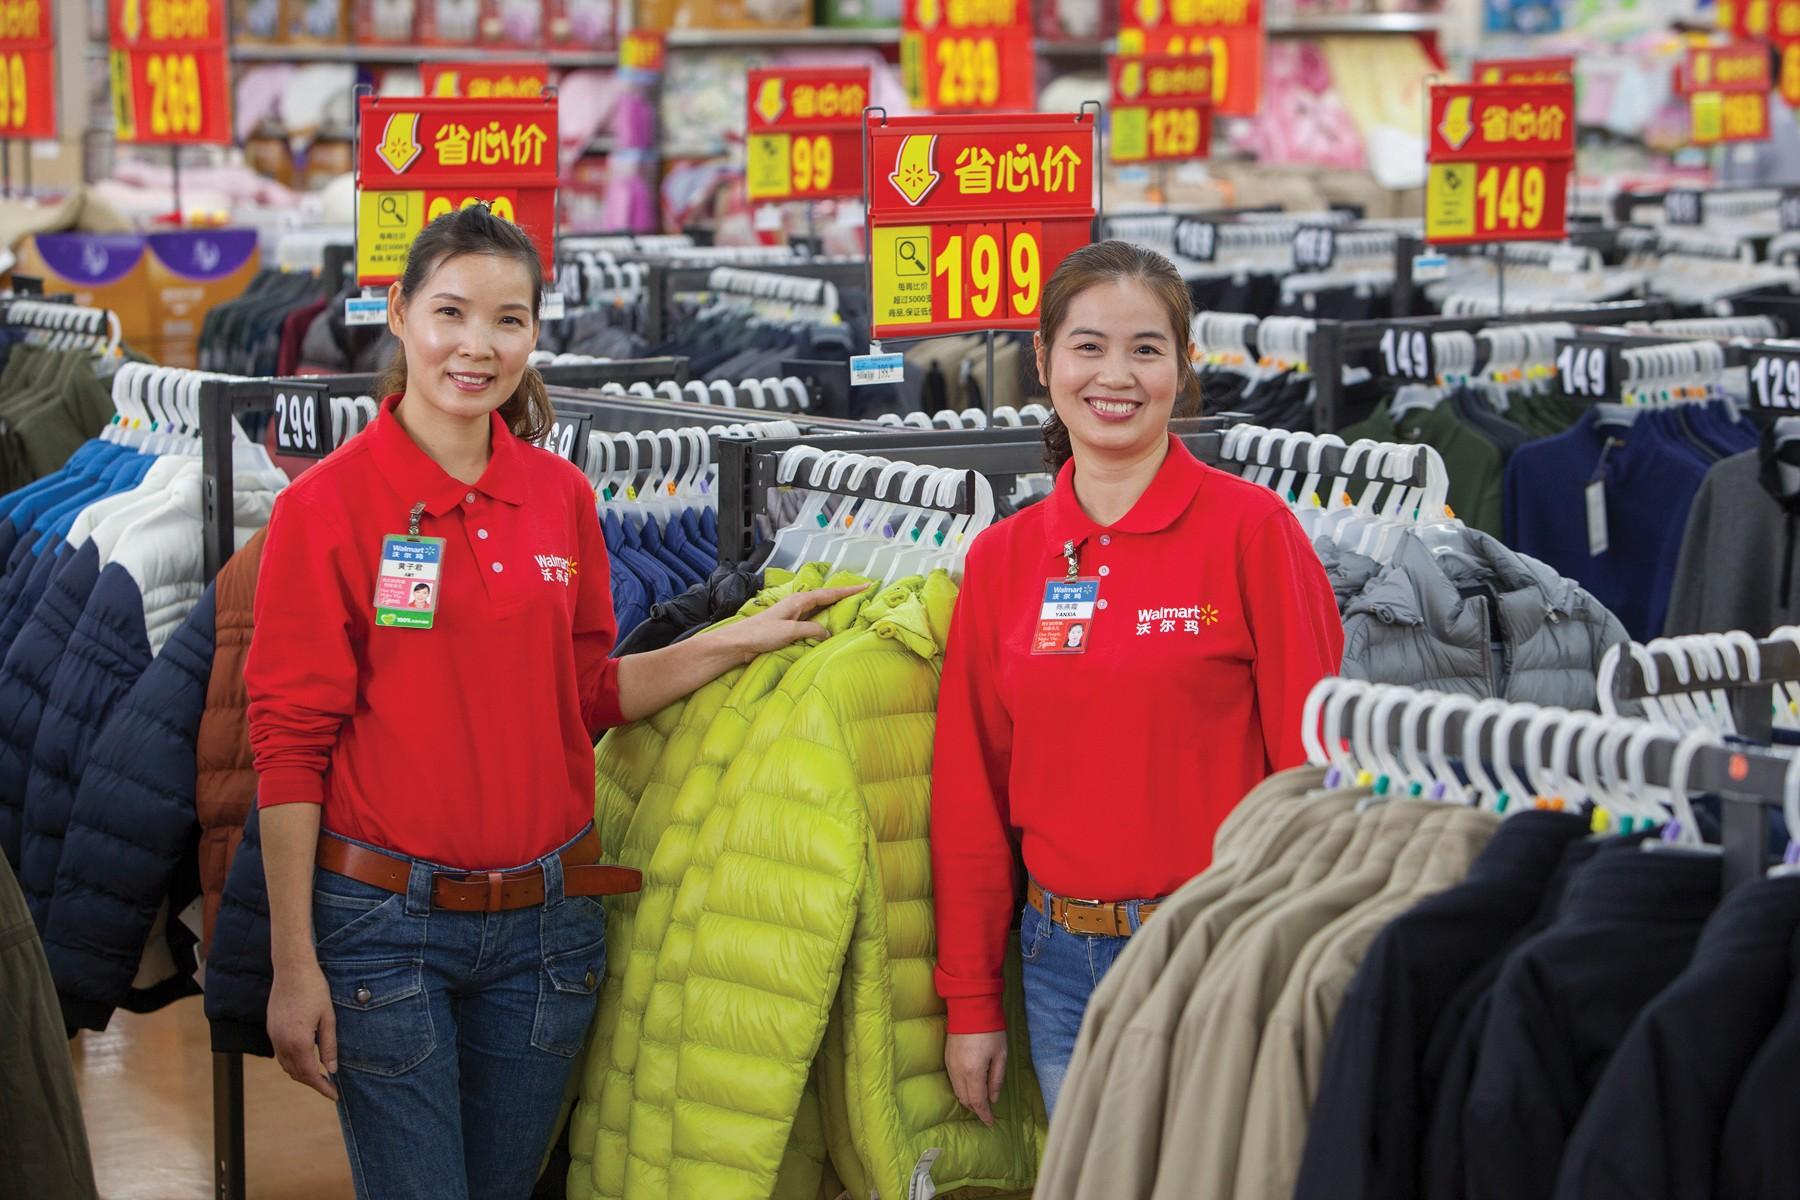 WMT_China_asociates_apparel_Z